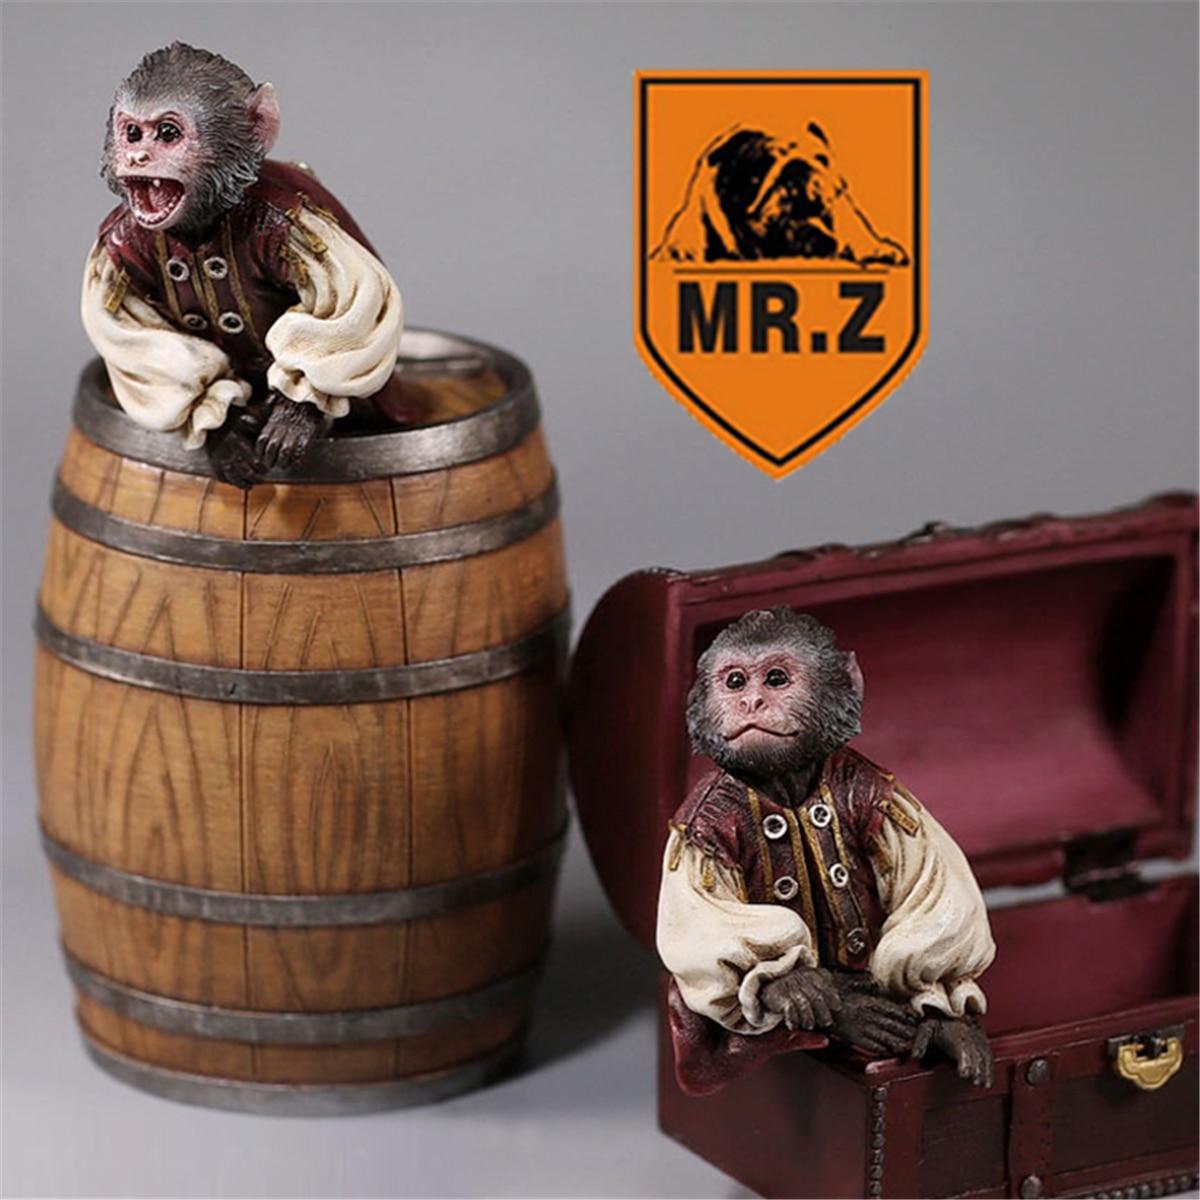 Mr.Z Studio 1:6 Scale Pirate Monkey Bucket Box Set Healing Figure Animal Model Toy Collector Desktop Decoration Adult Gift